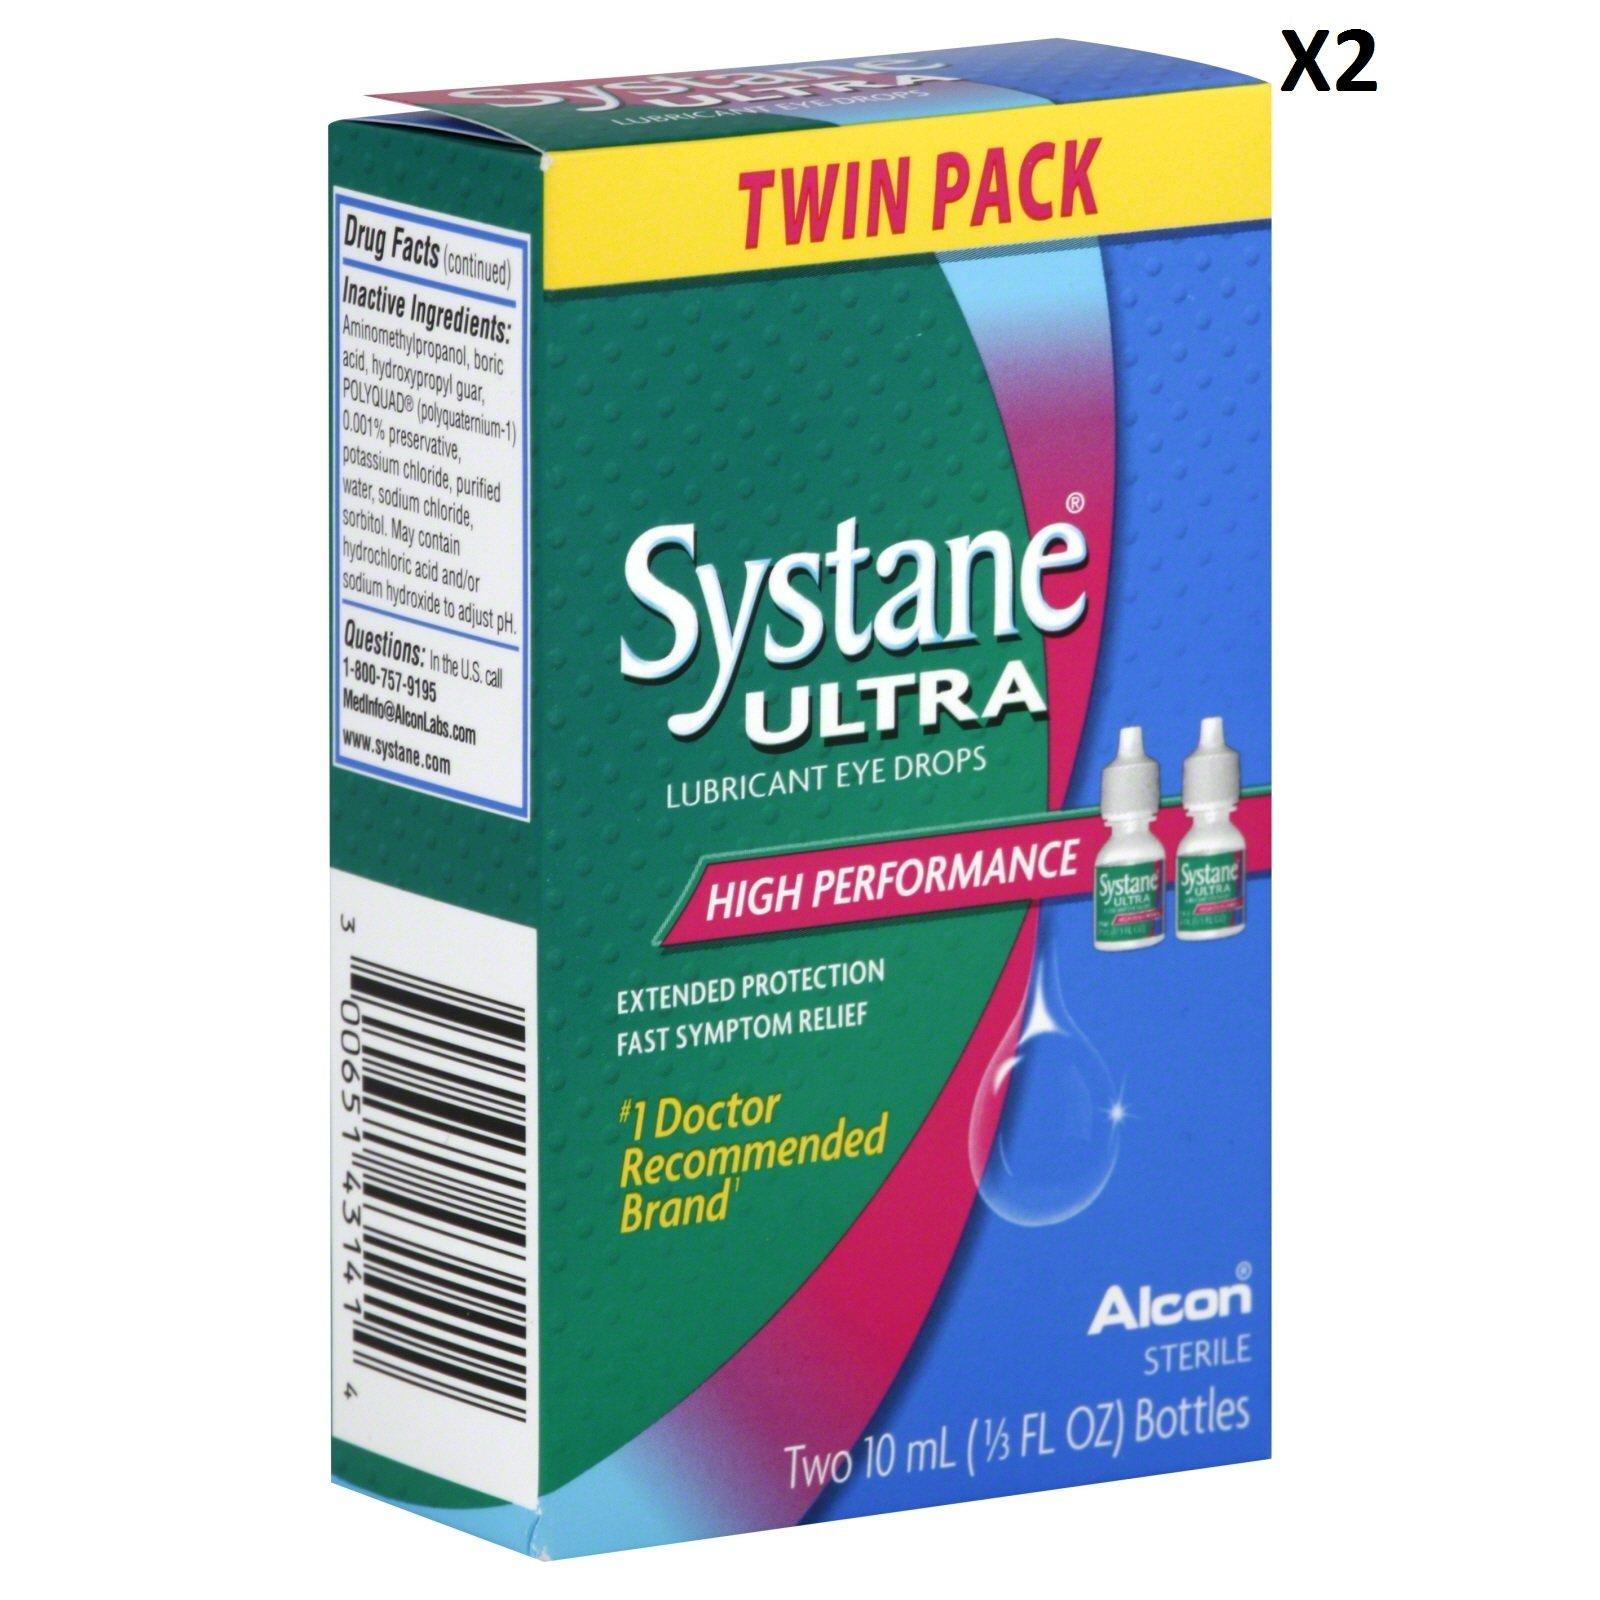 Systane Ultra Lubricant Eye Drops, 0.33 fl oz (10 ml) Bottle (2 Count)